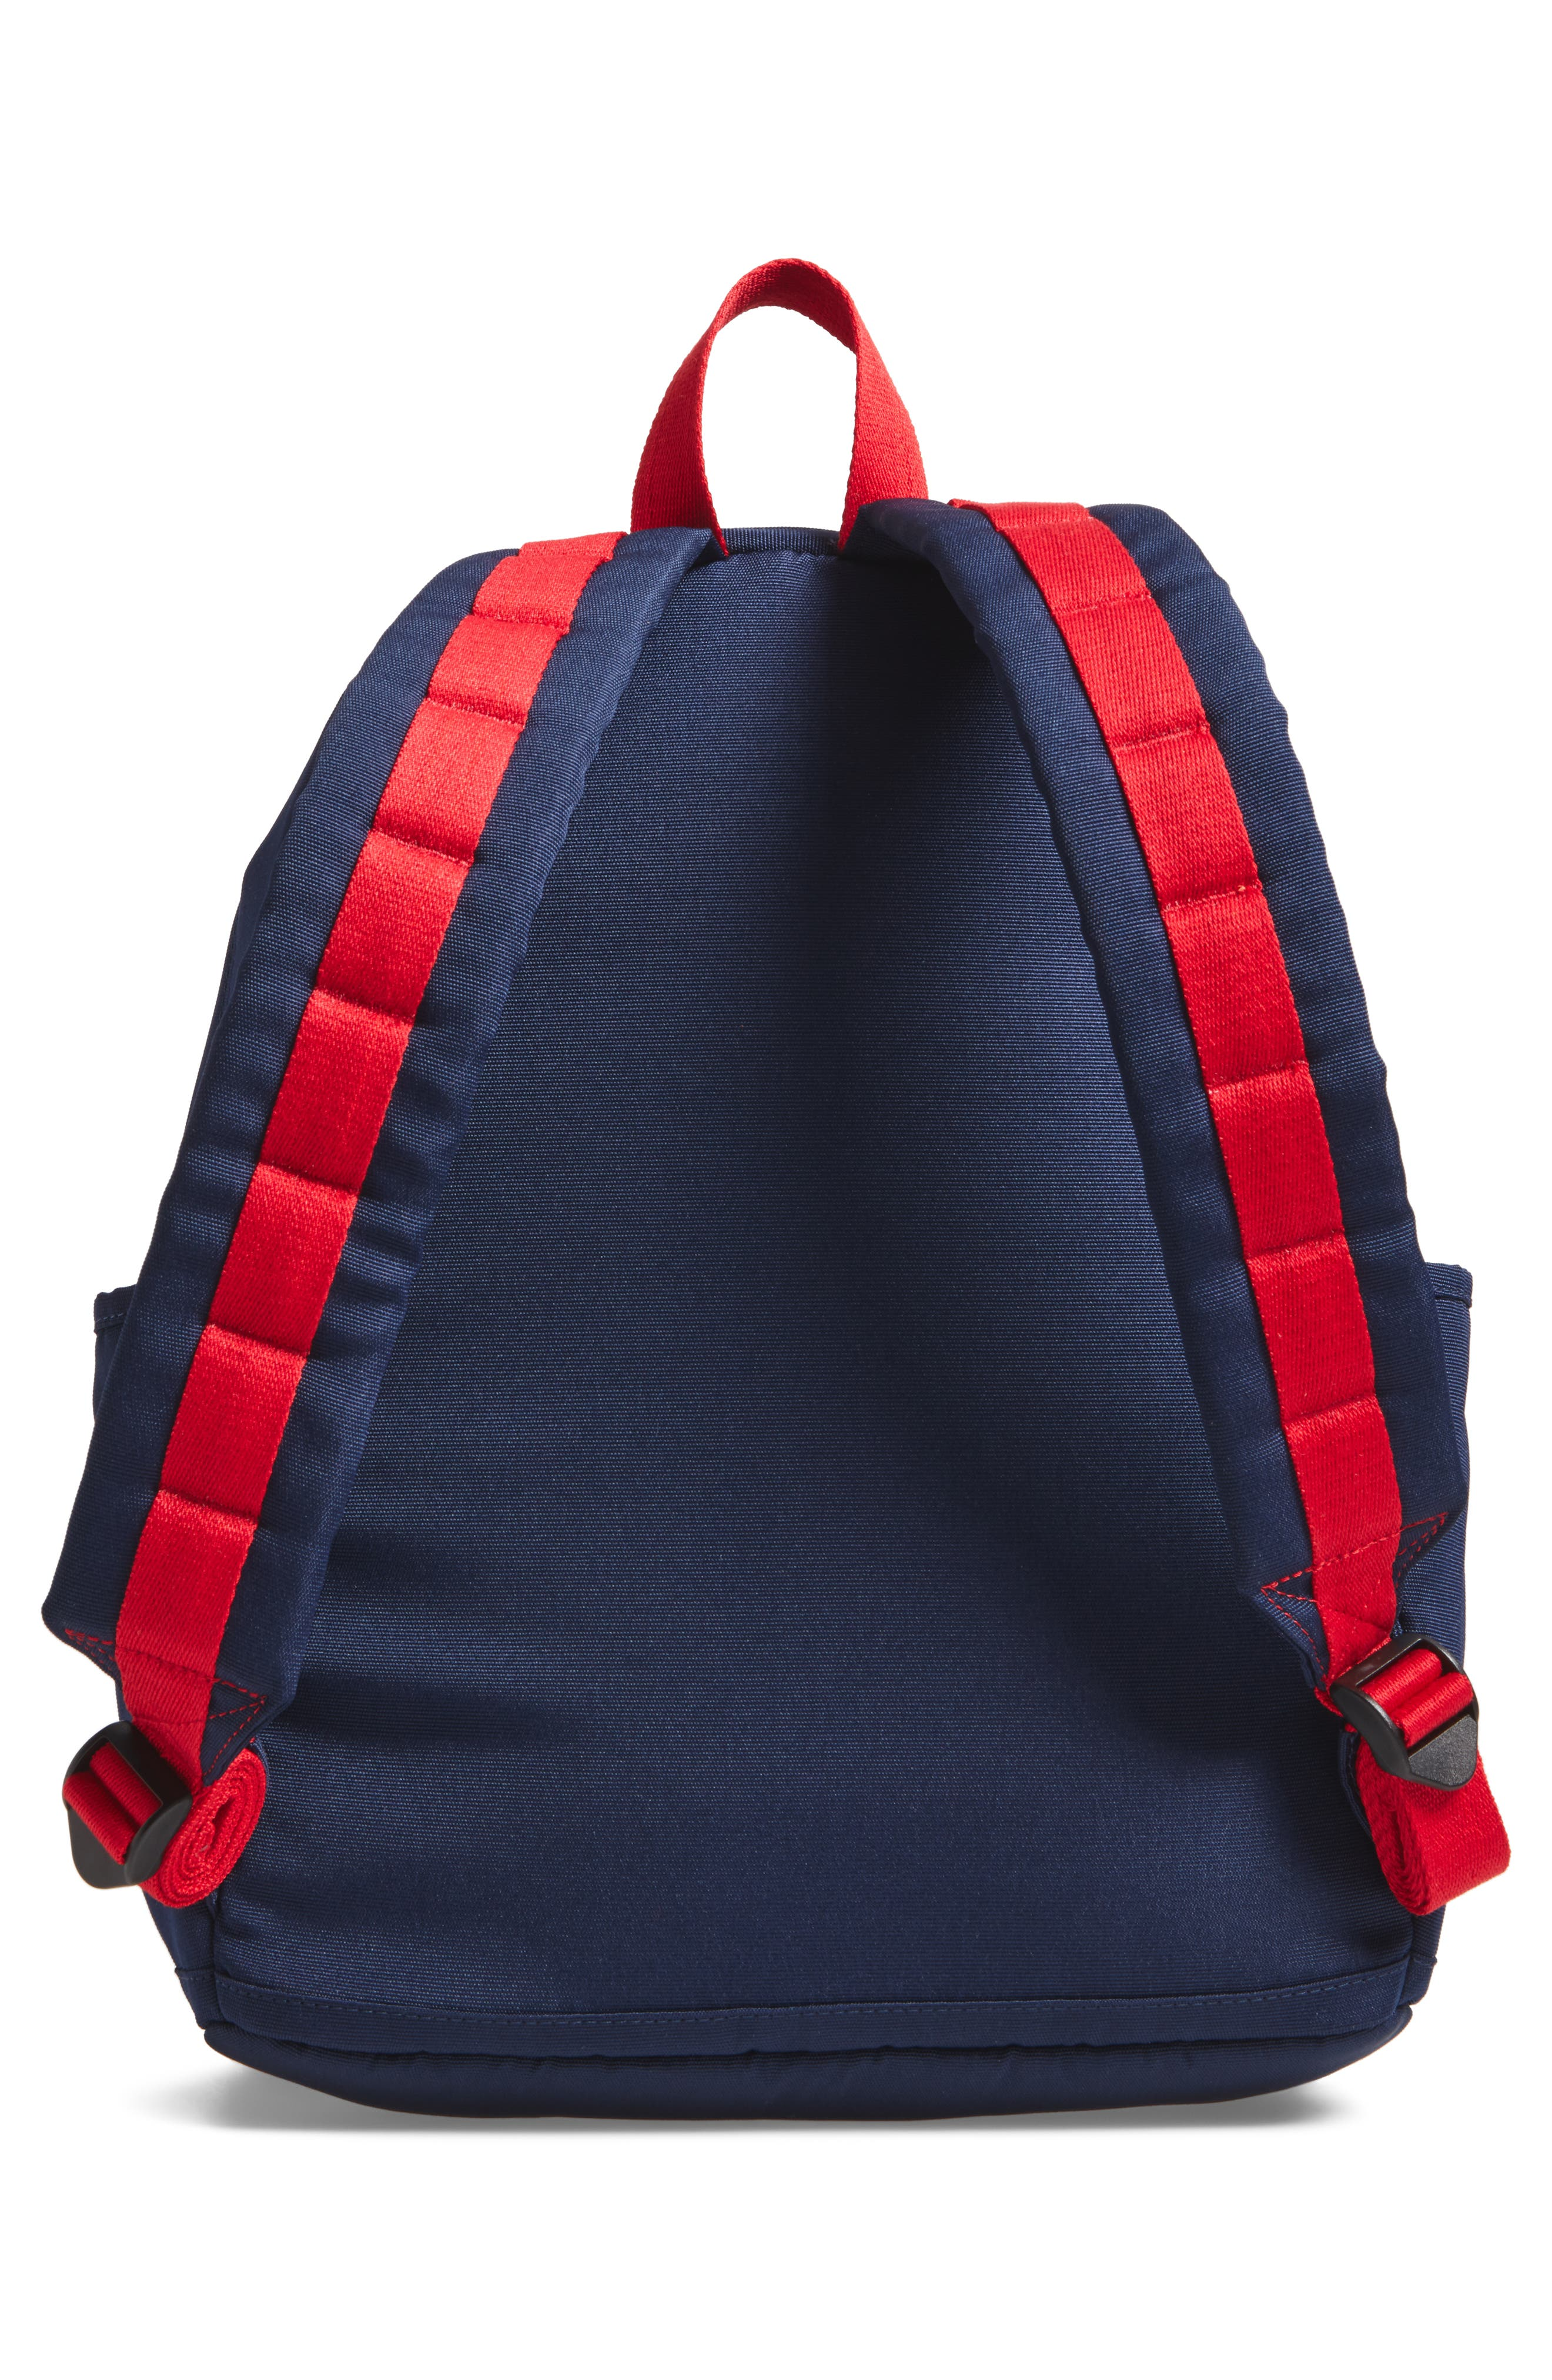 Williamsburg Bedford Backpack,                             Alternate thumbnail 9, color,